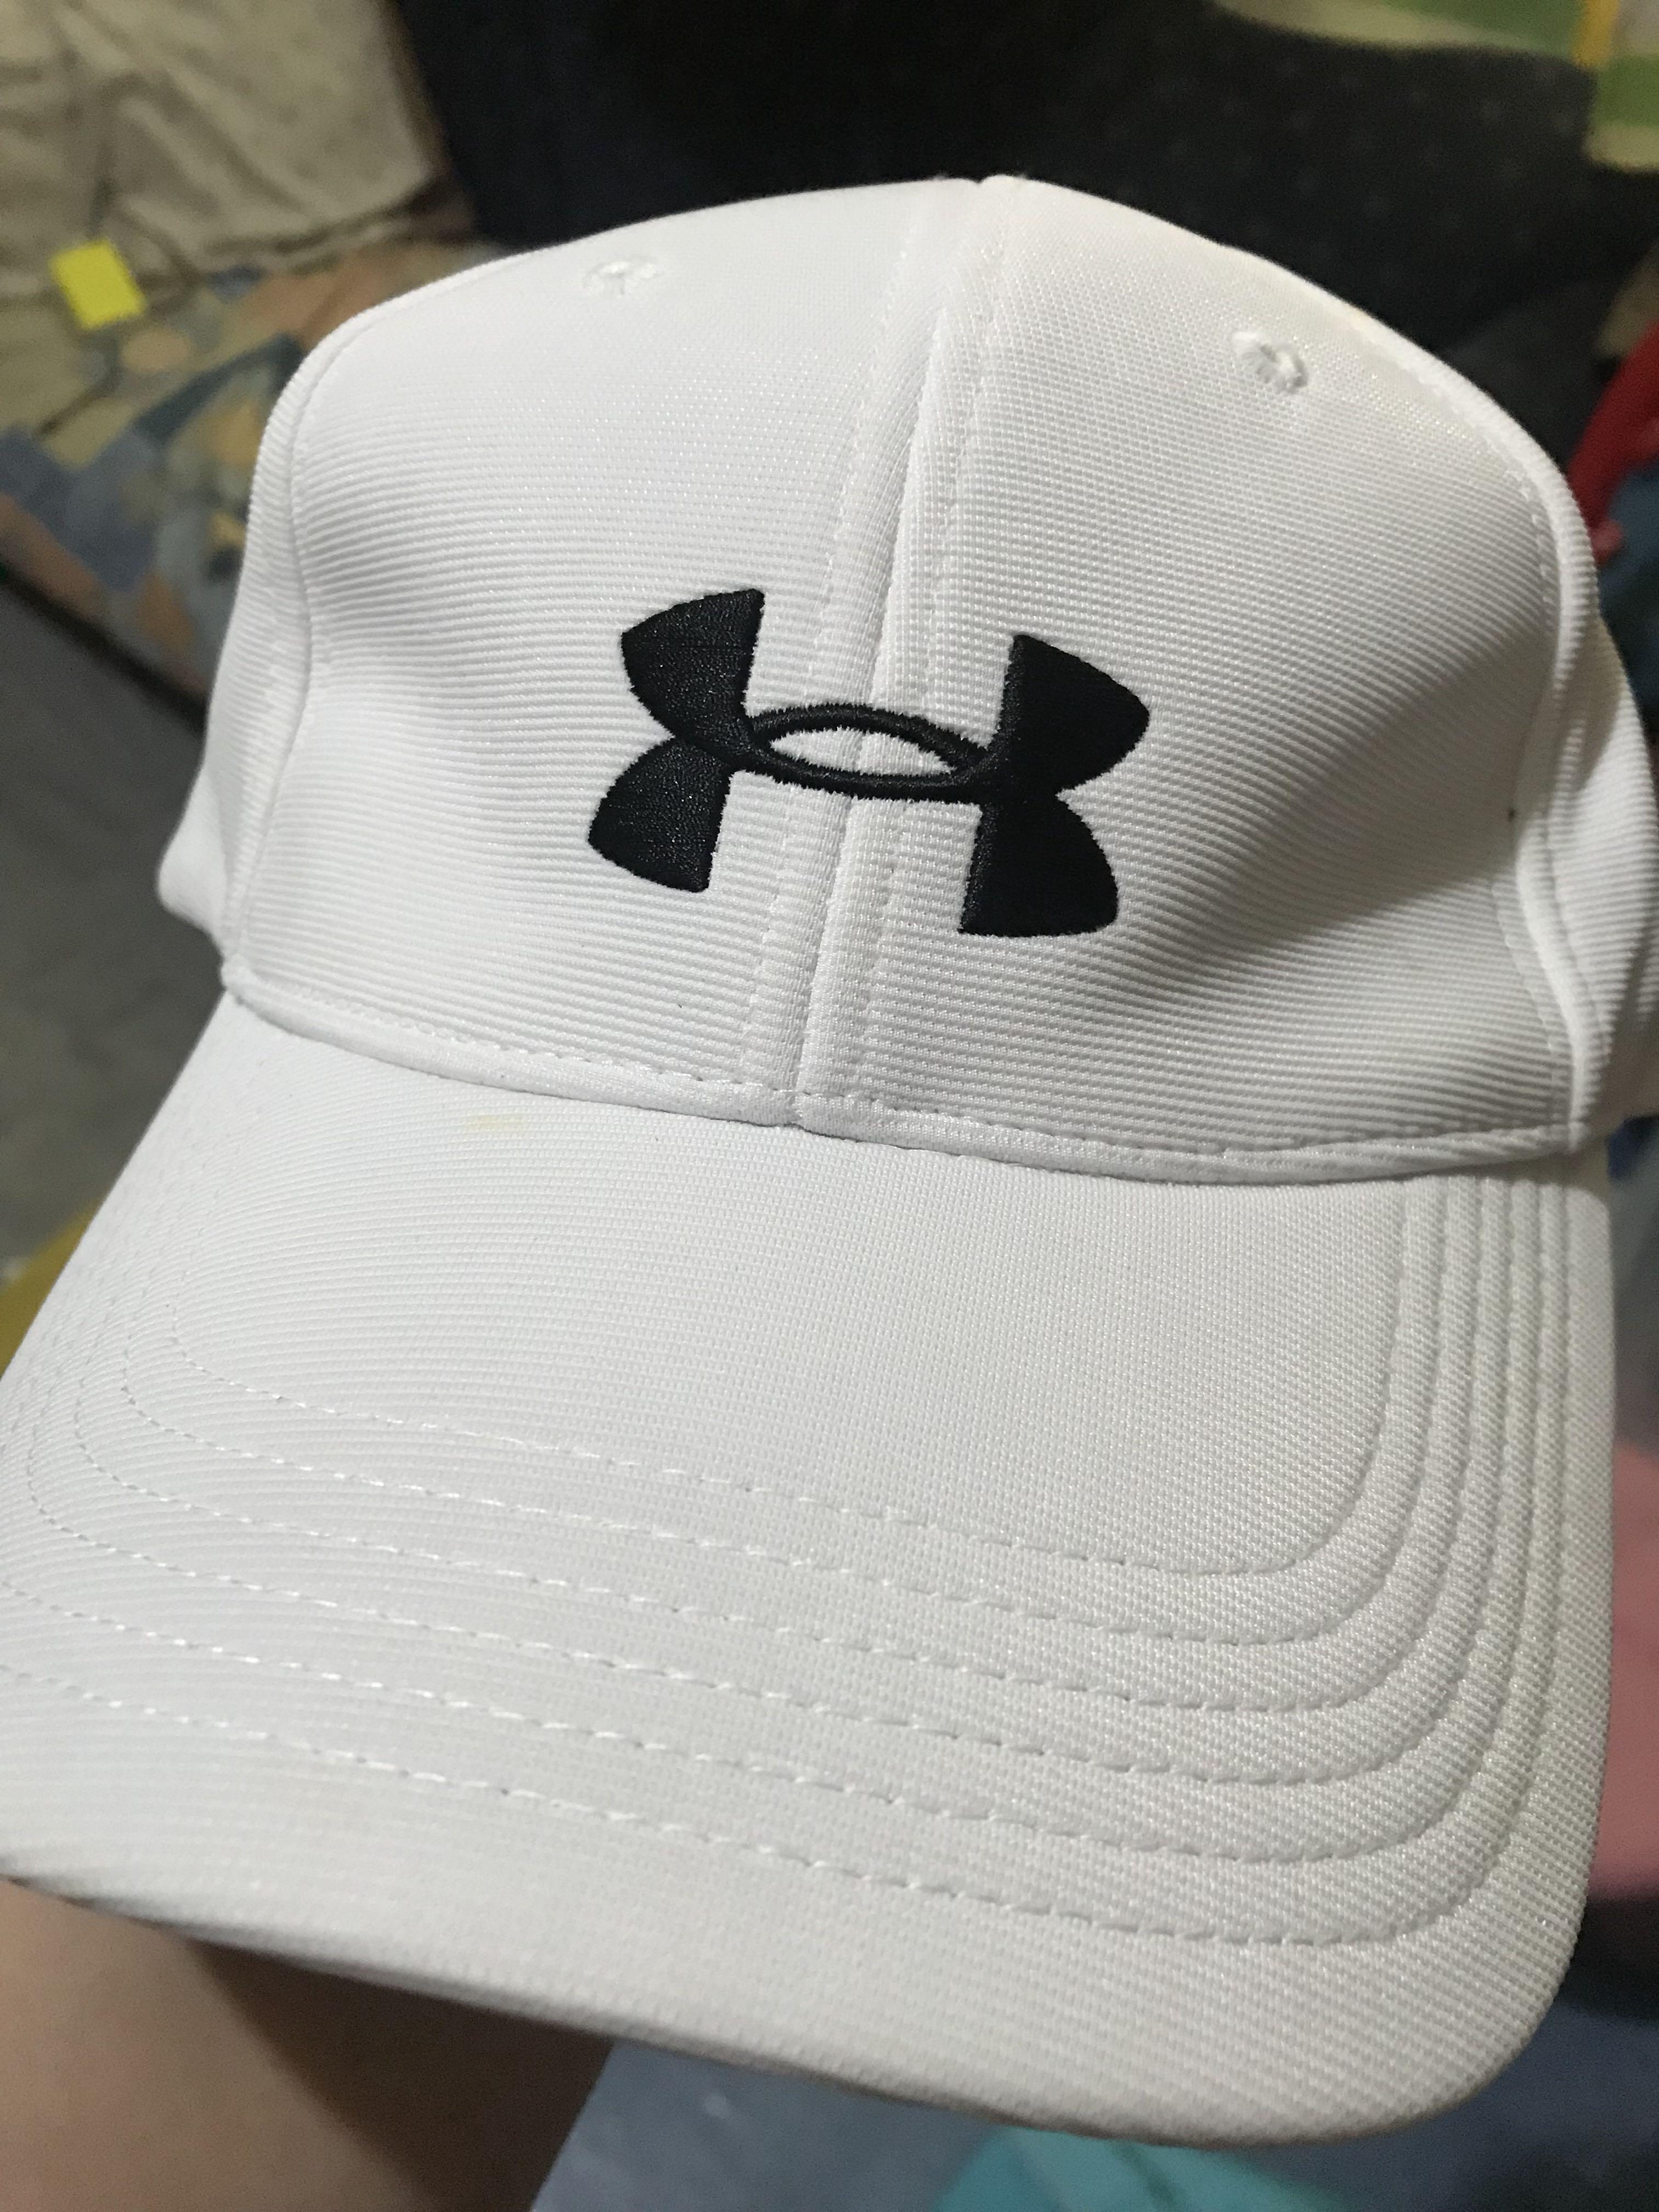 019b665802b Home · Men s Fashion · Accessories · Caps   Hats. photo photo photo photo  photo